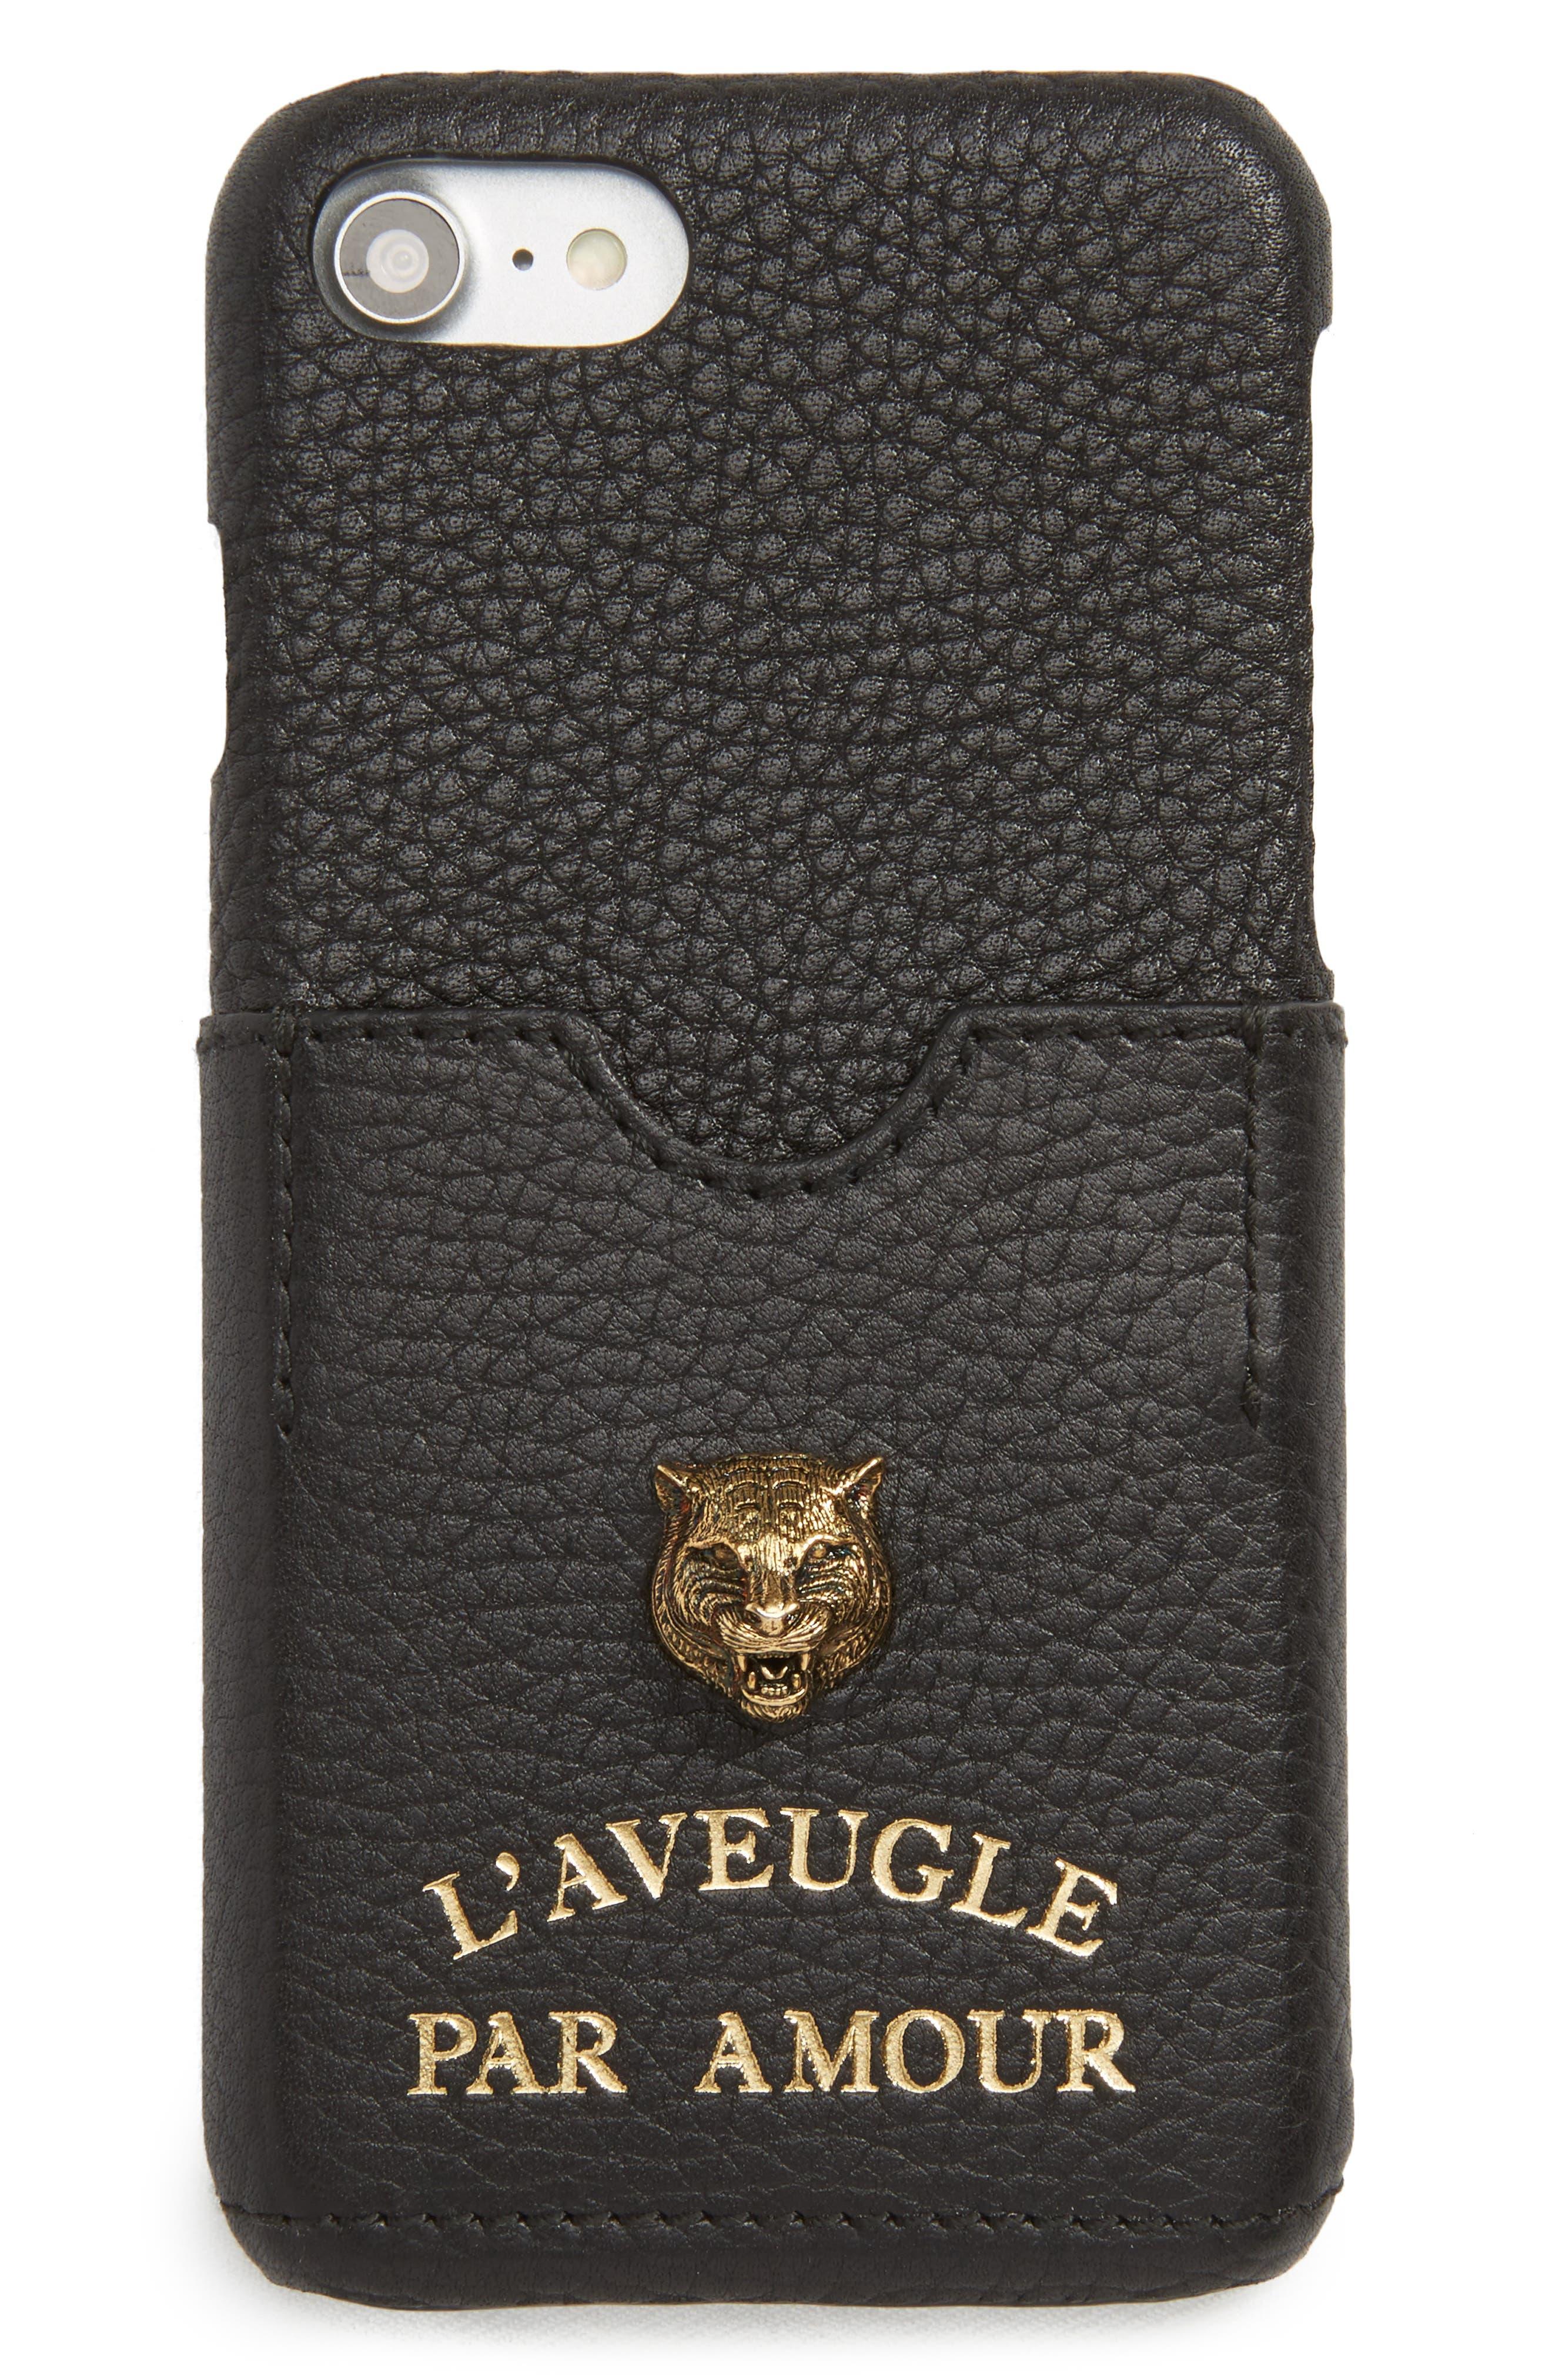 GUCCI Tiger LAveugle Par Amour Leather iPhone 7 Case